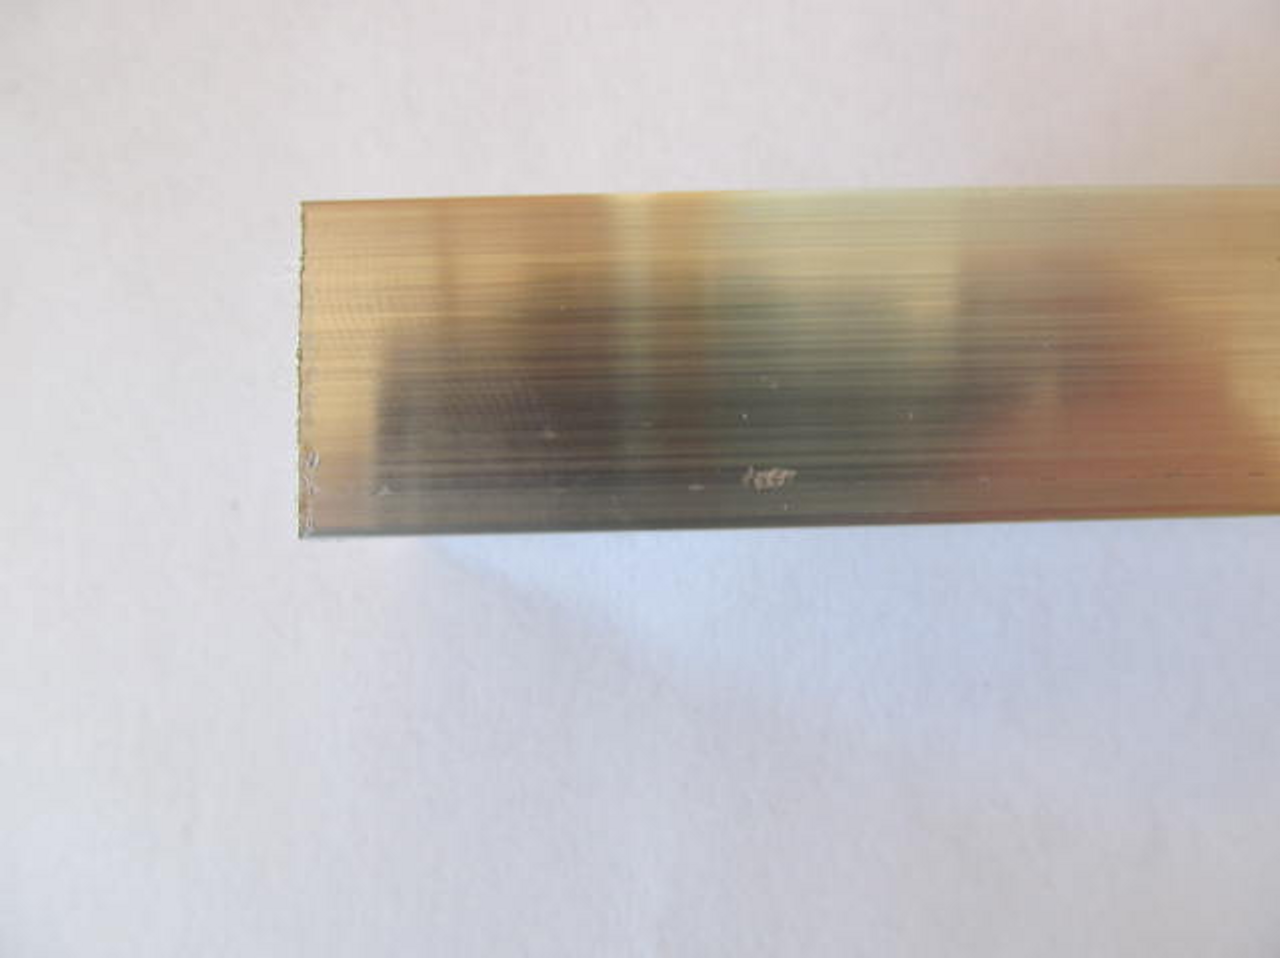 Aluminum U-Channel (CHW142) UNDERSIDE PICTURED